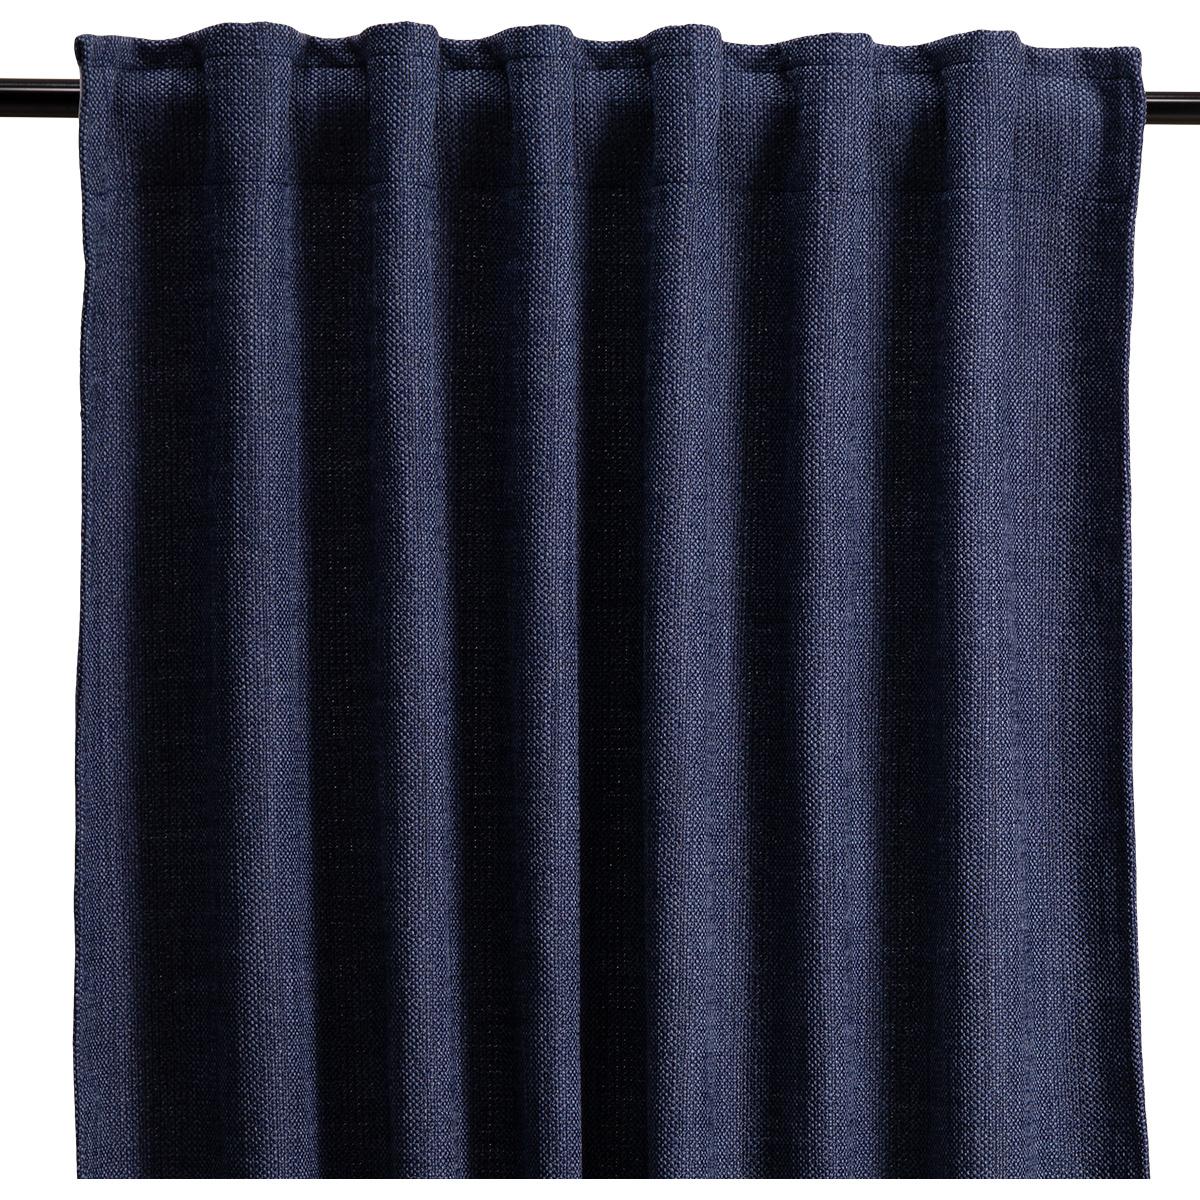 Navy Blue Materia Curtain